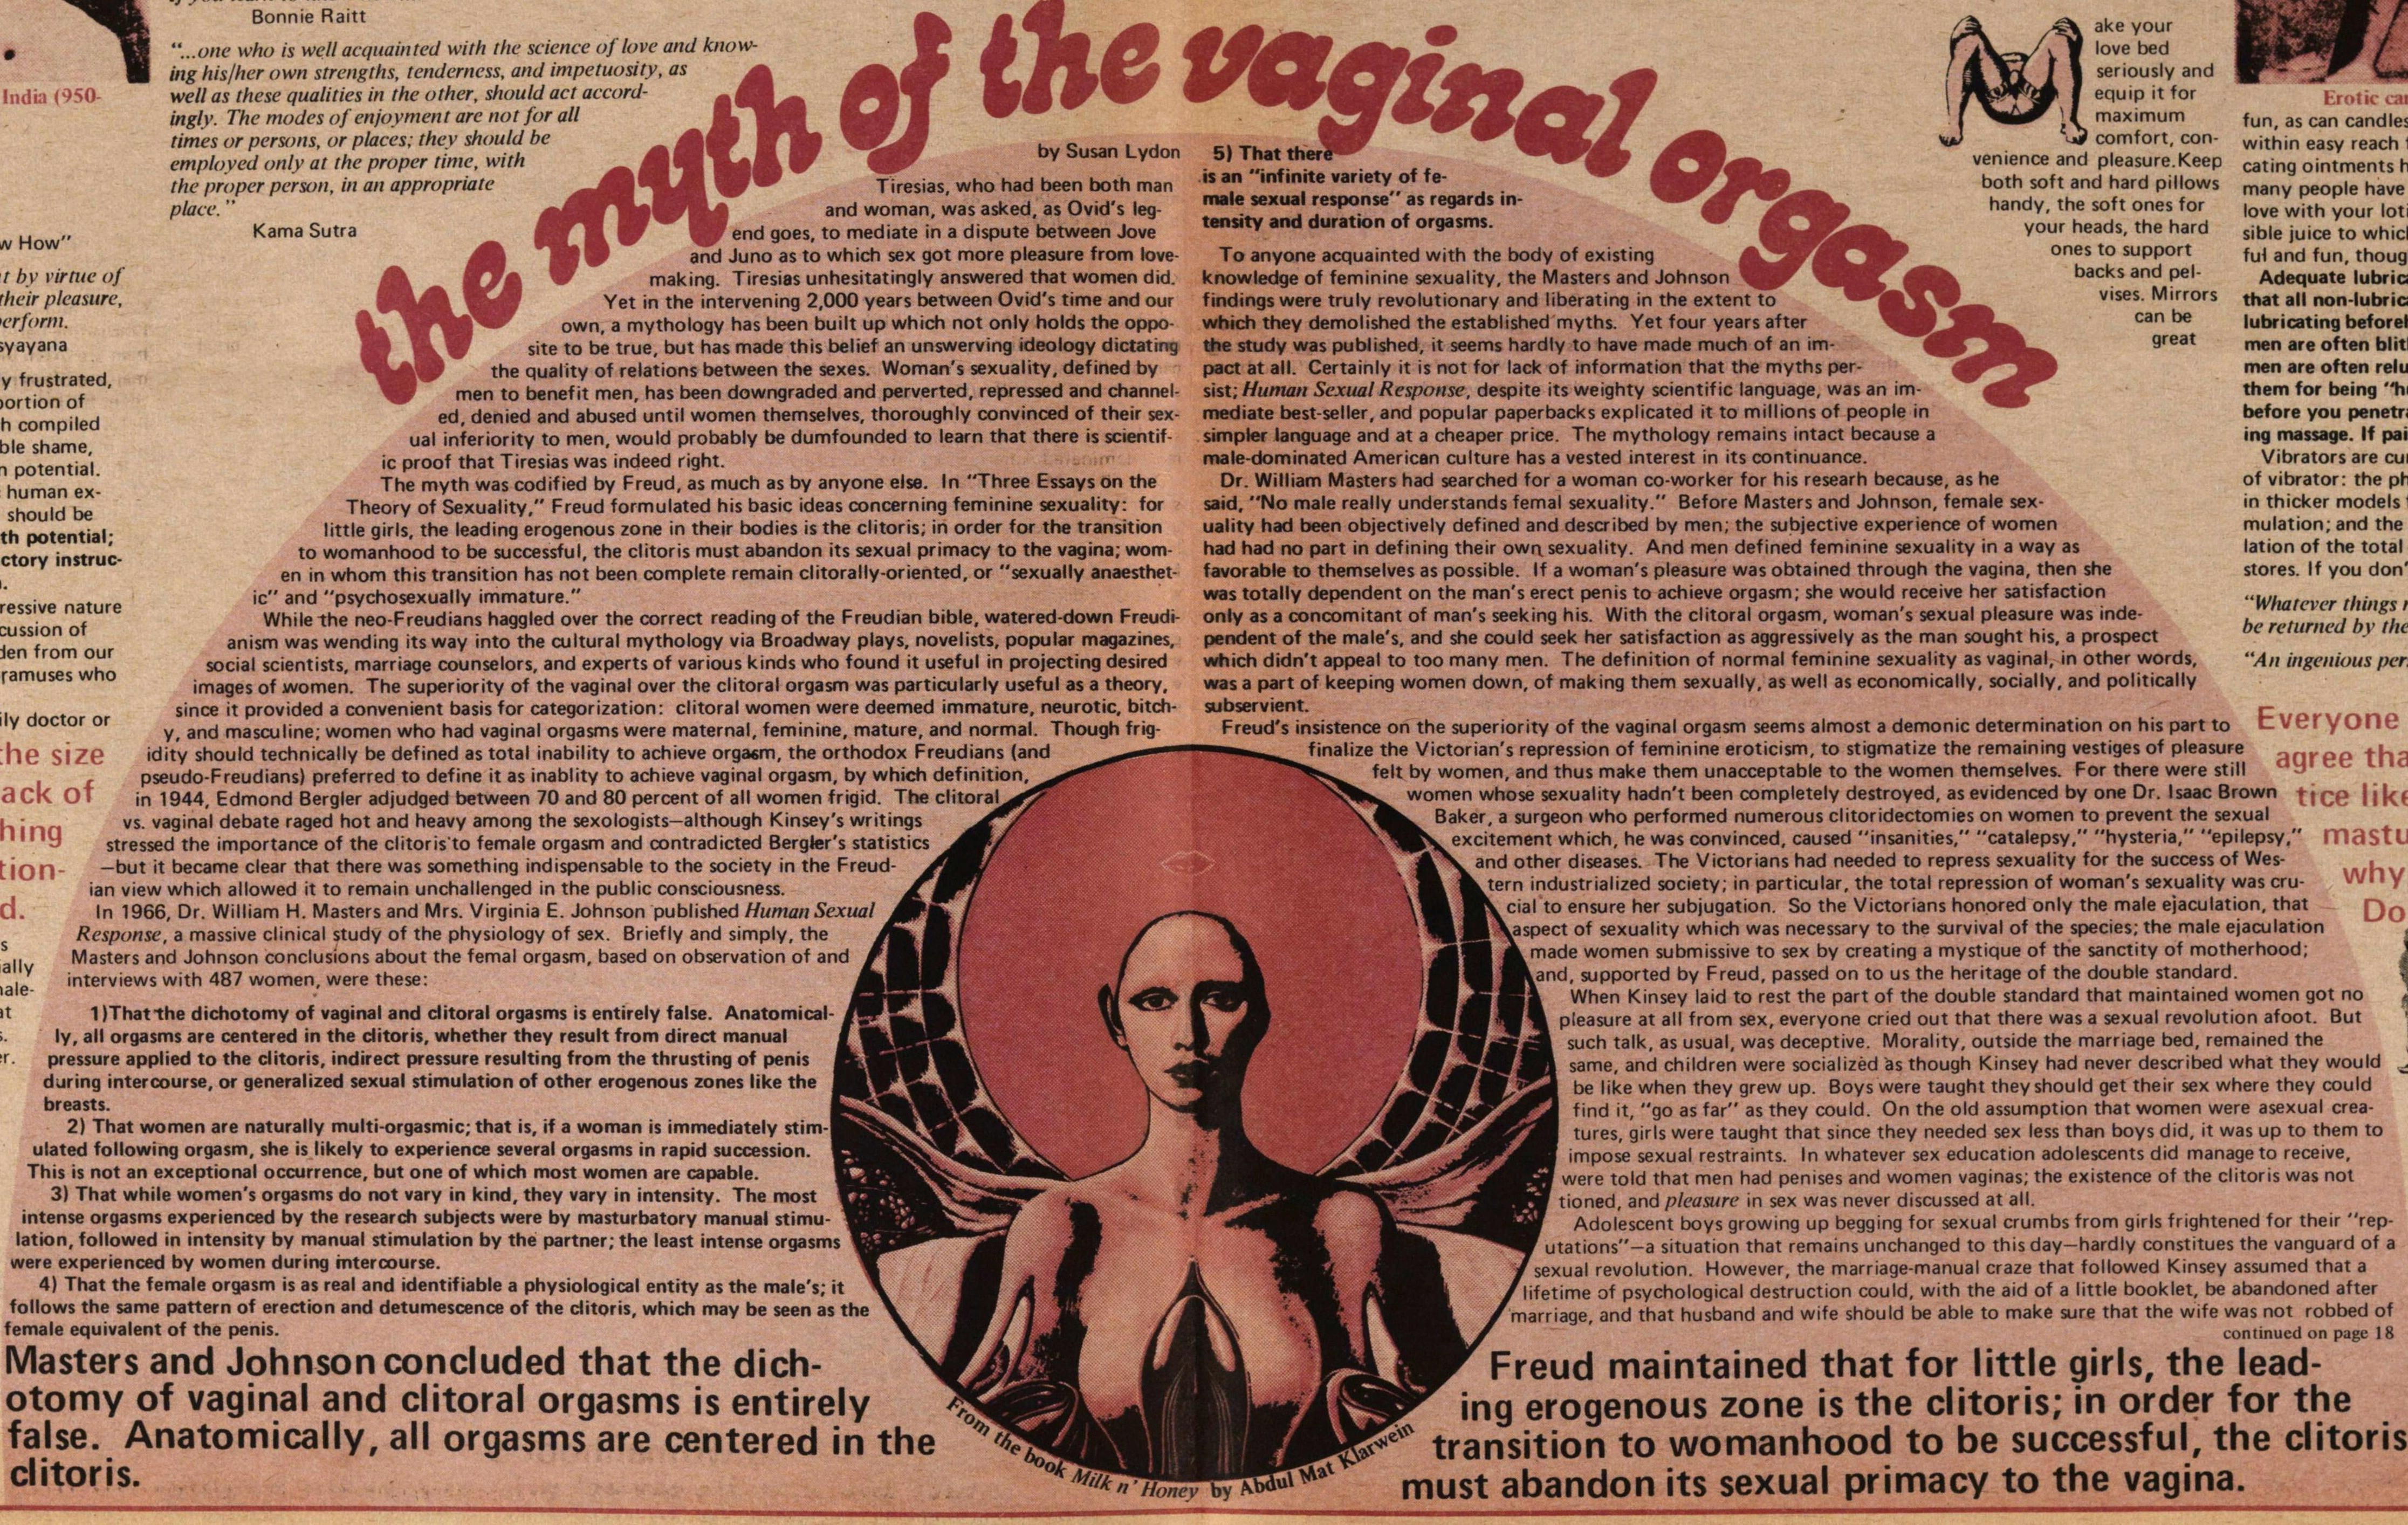 Myth of multiple orgasms